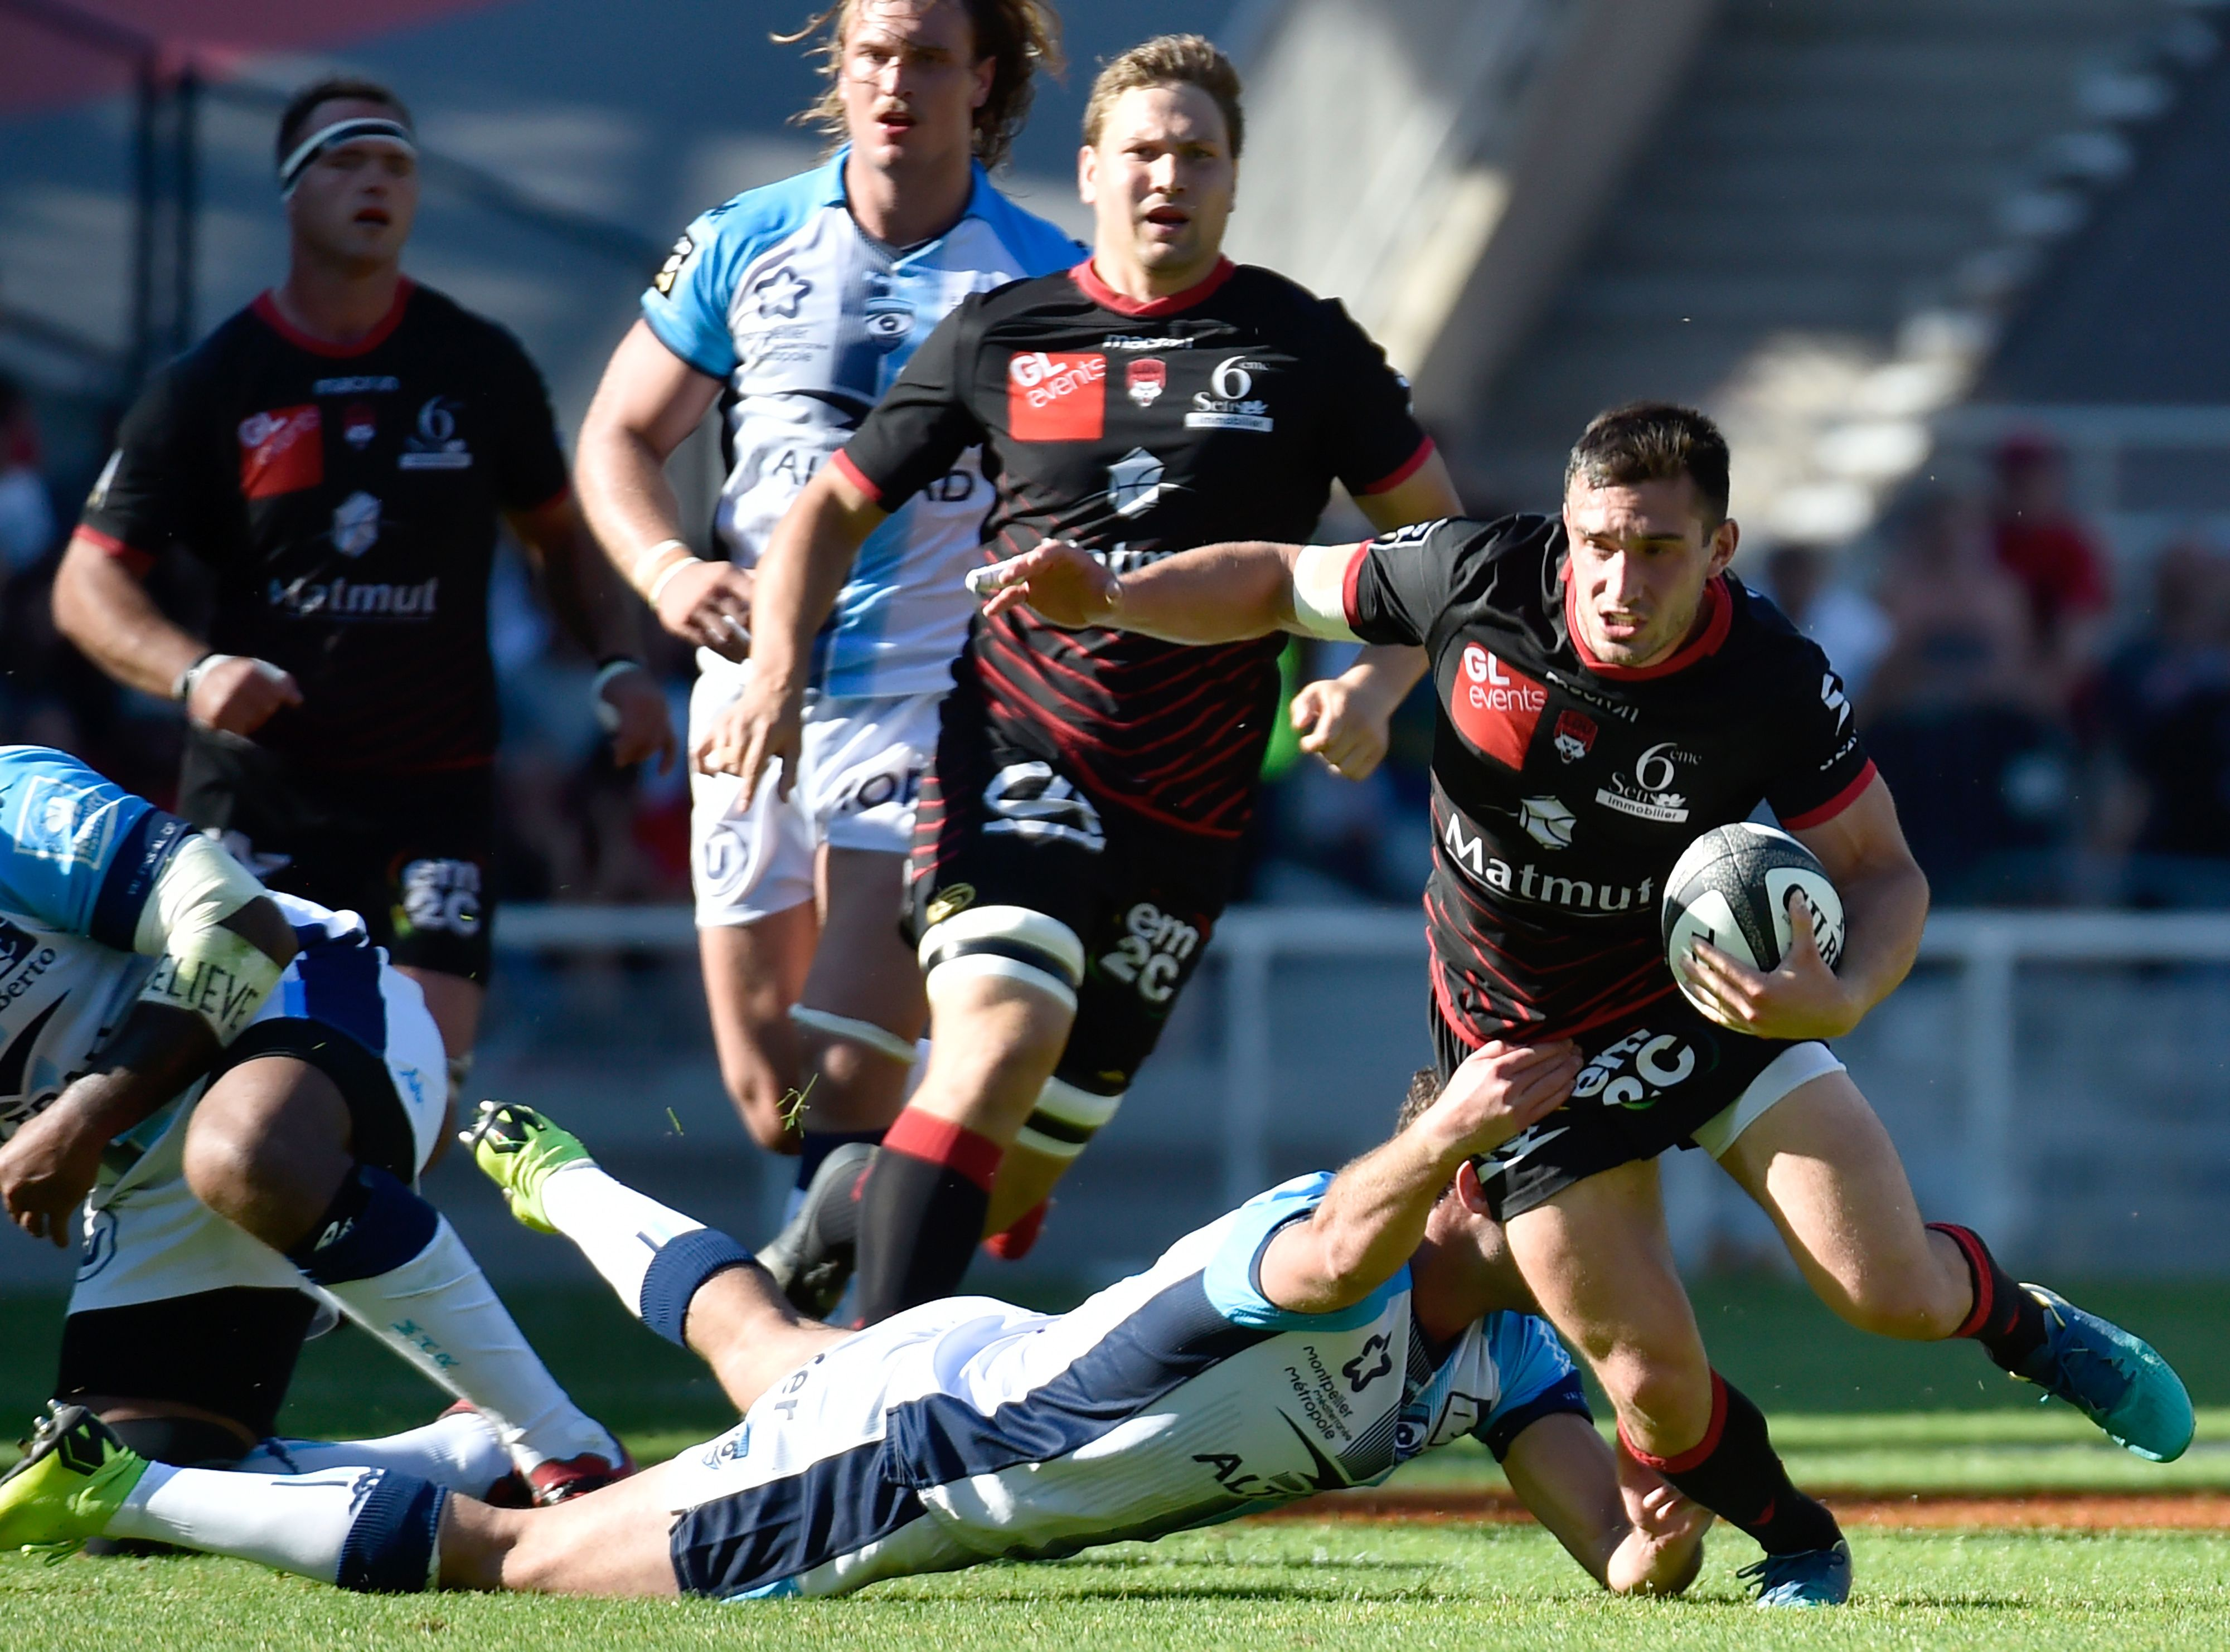 Rugby - Top 14 - Couilloud : «Si on perd contre Clermont, ce sera un échec»